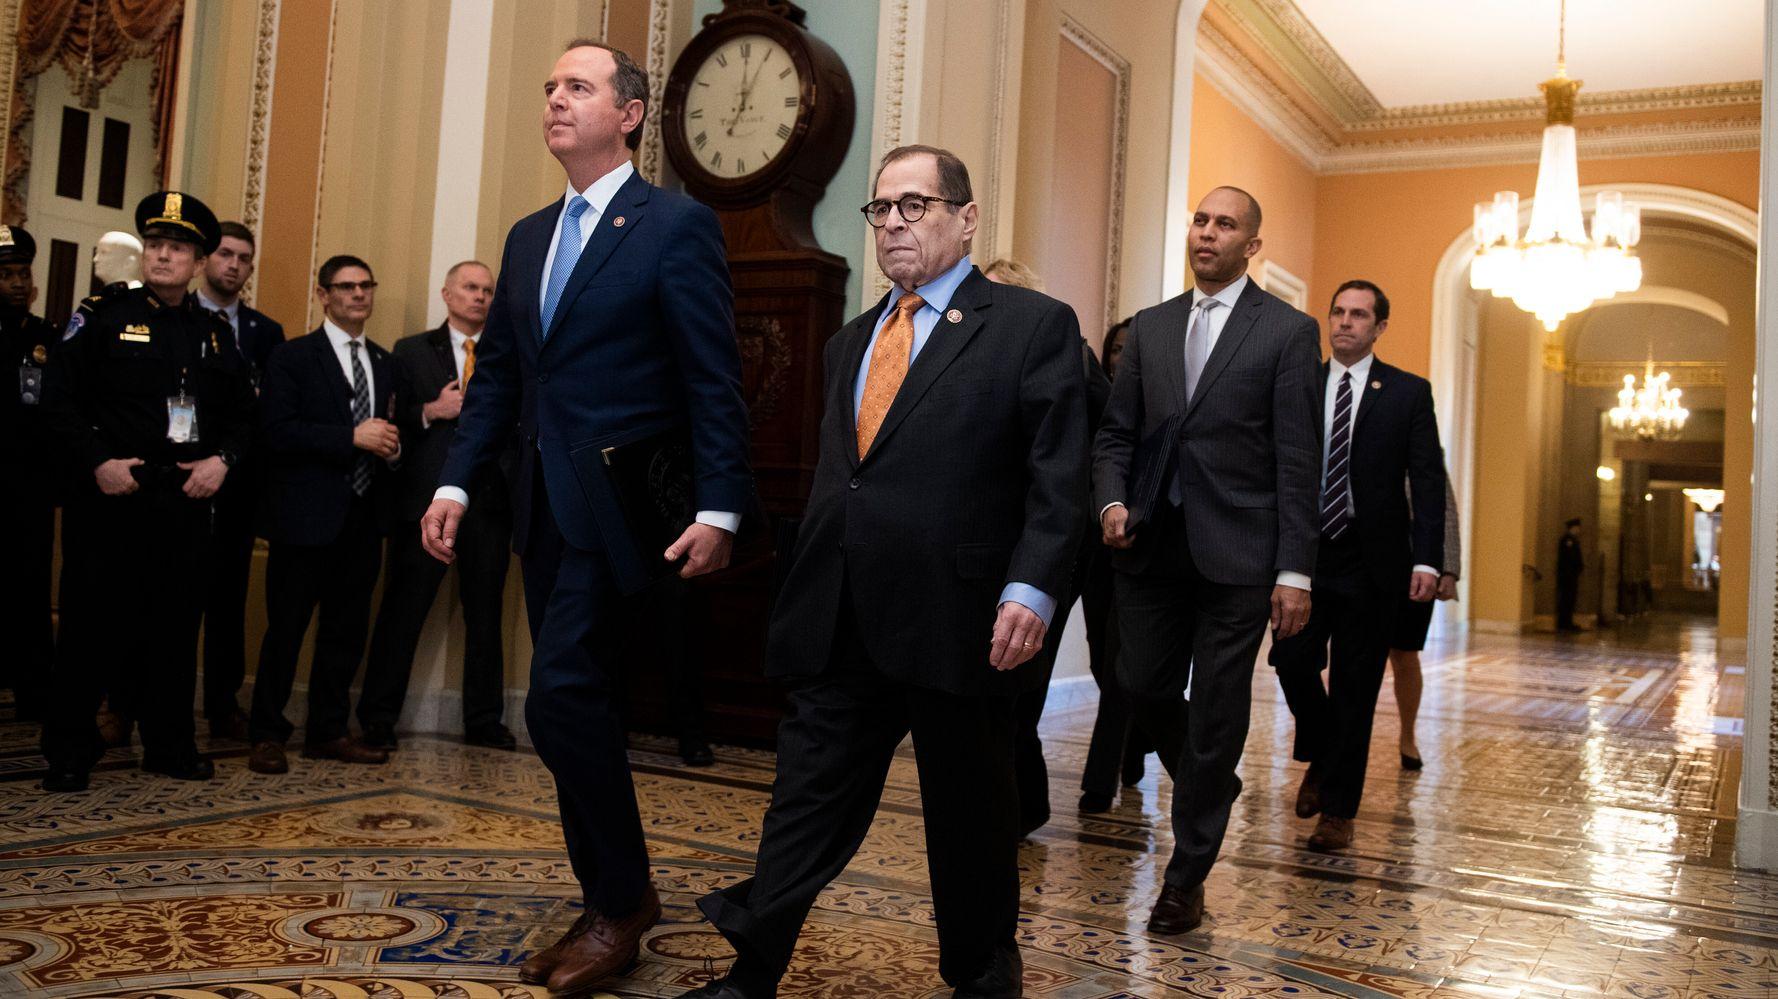 Westlake Legal Group 5e248a0b220000d8063f7bdb Schiff, Nadler Slam Trump Team's Defense That 'Abuse Of Power' Isn't Impeachable